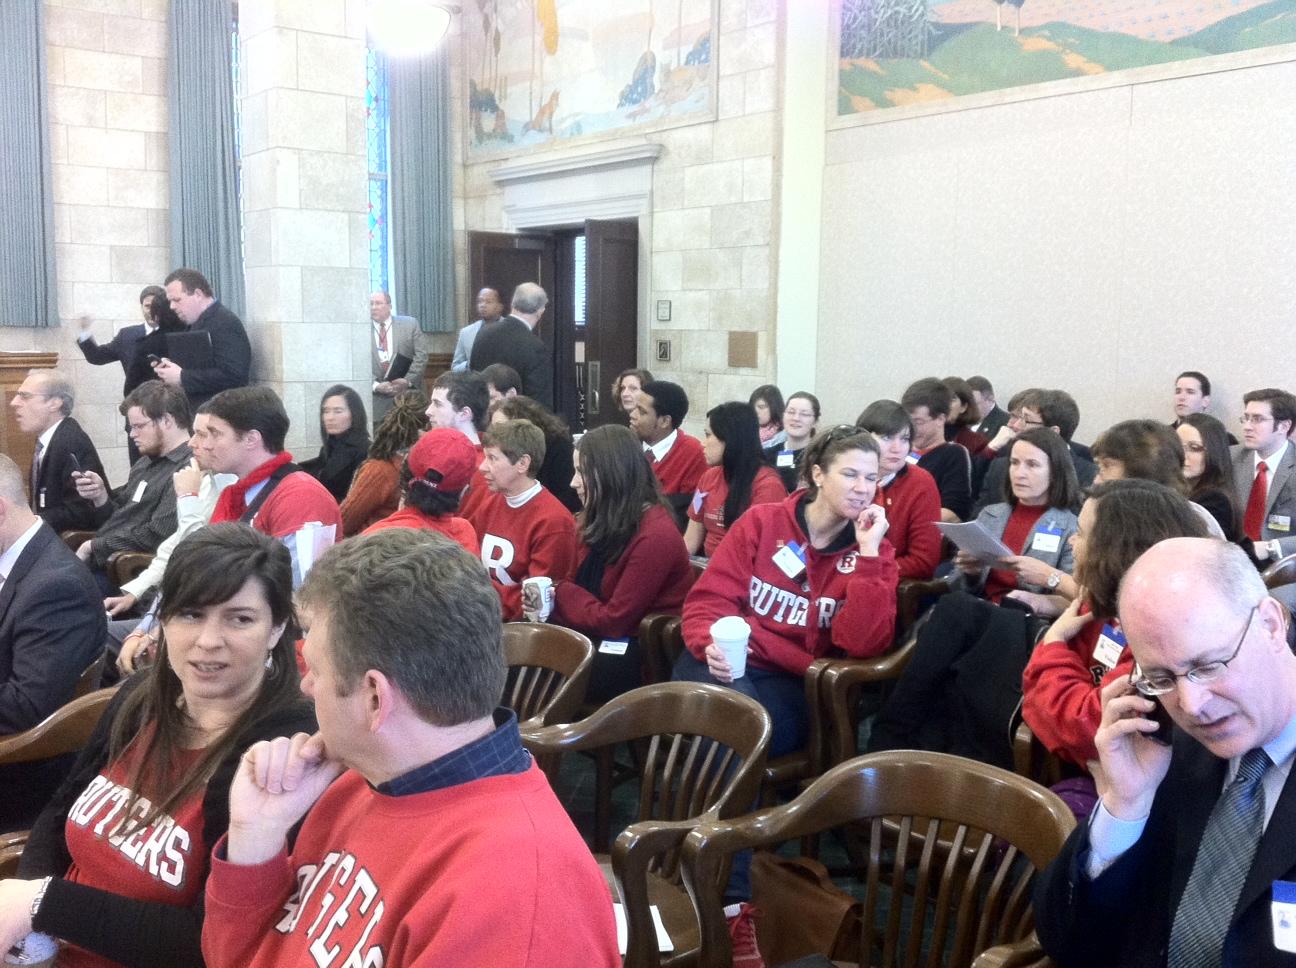 Save Rutgers: LIVE Coverage of the First Rutgers/Rowan Merger Senate Hearing